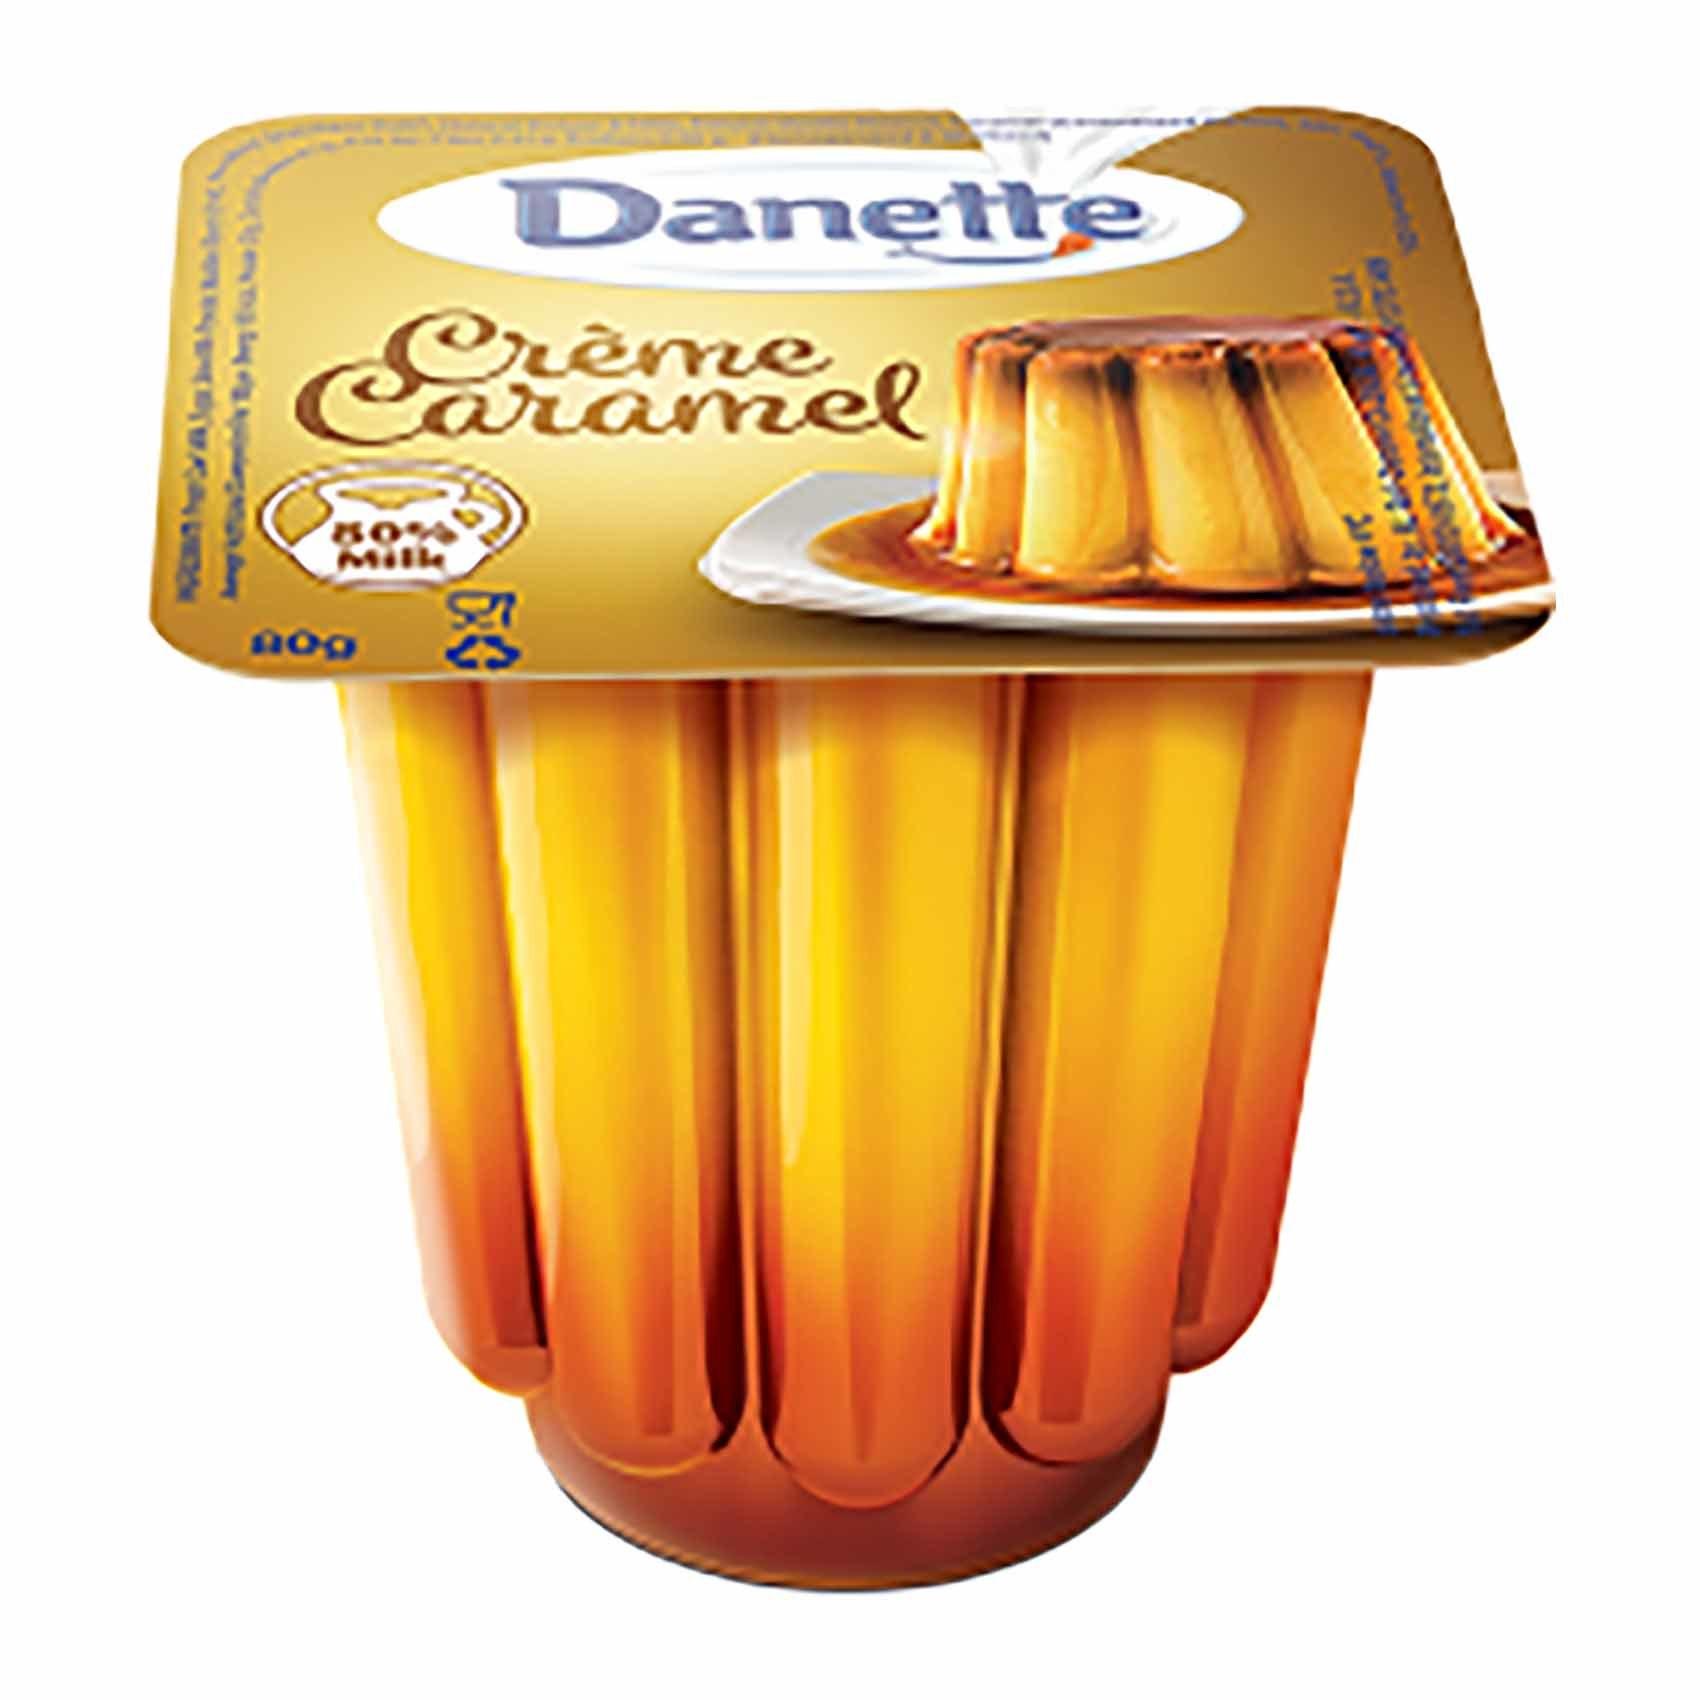 Buy Danette Cream Caramel 75 Gm Online Shop Fresh Food On Carrefour Egypt